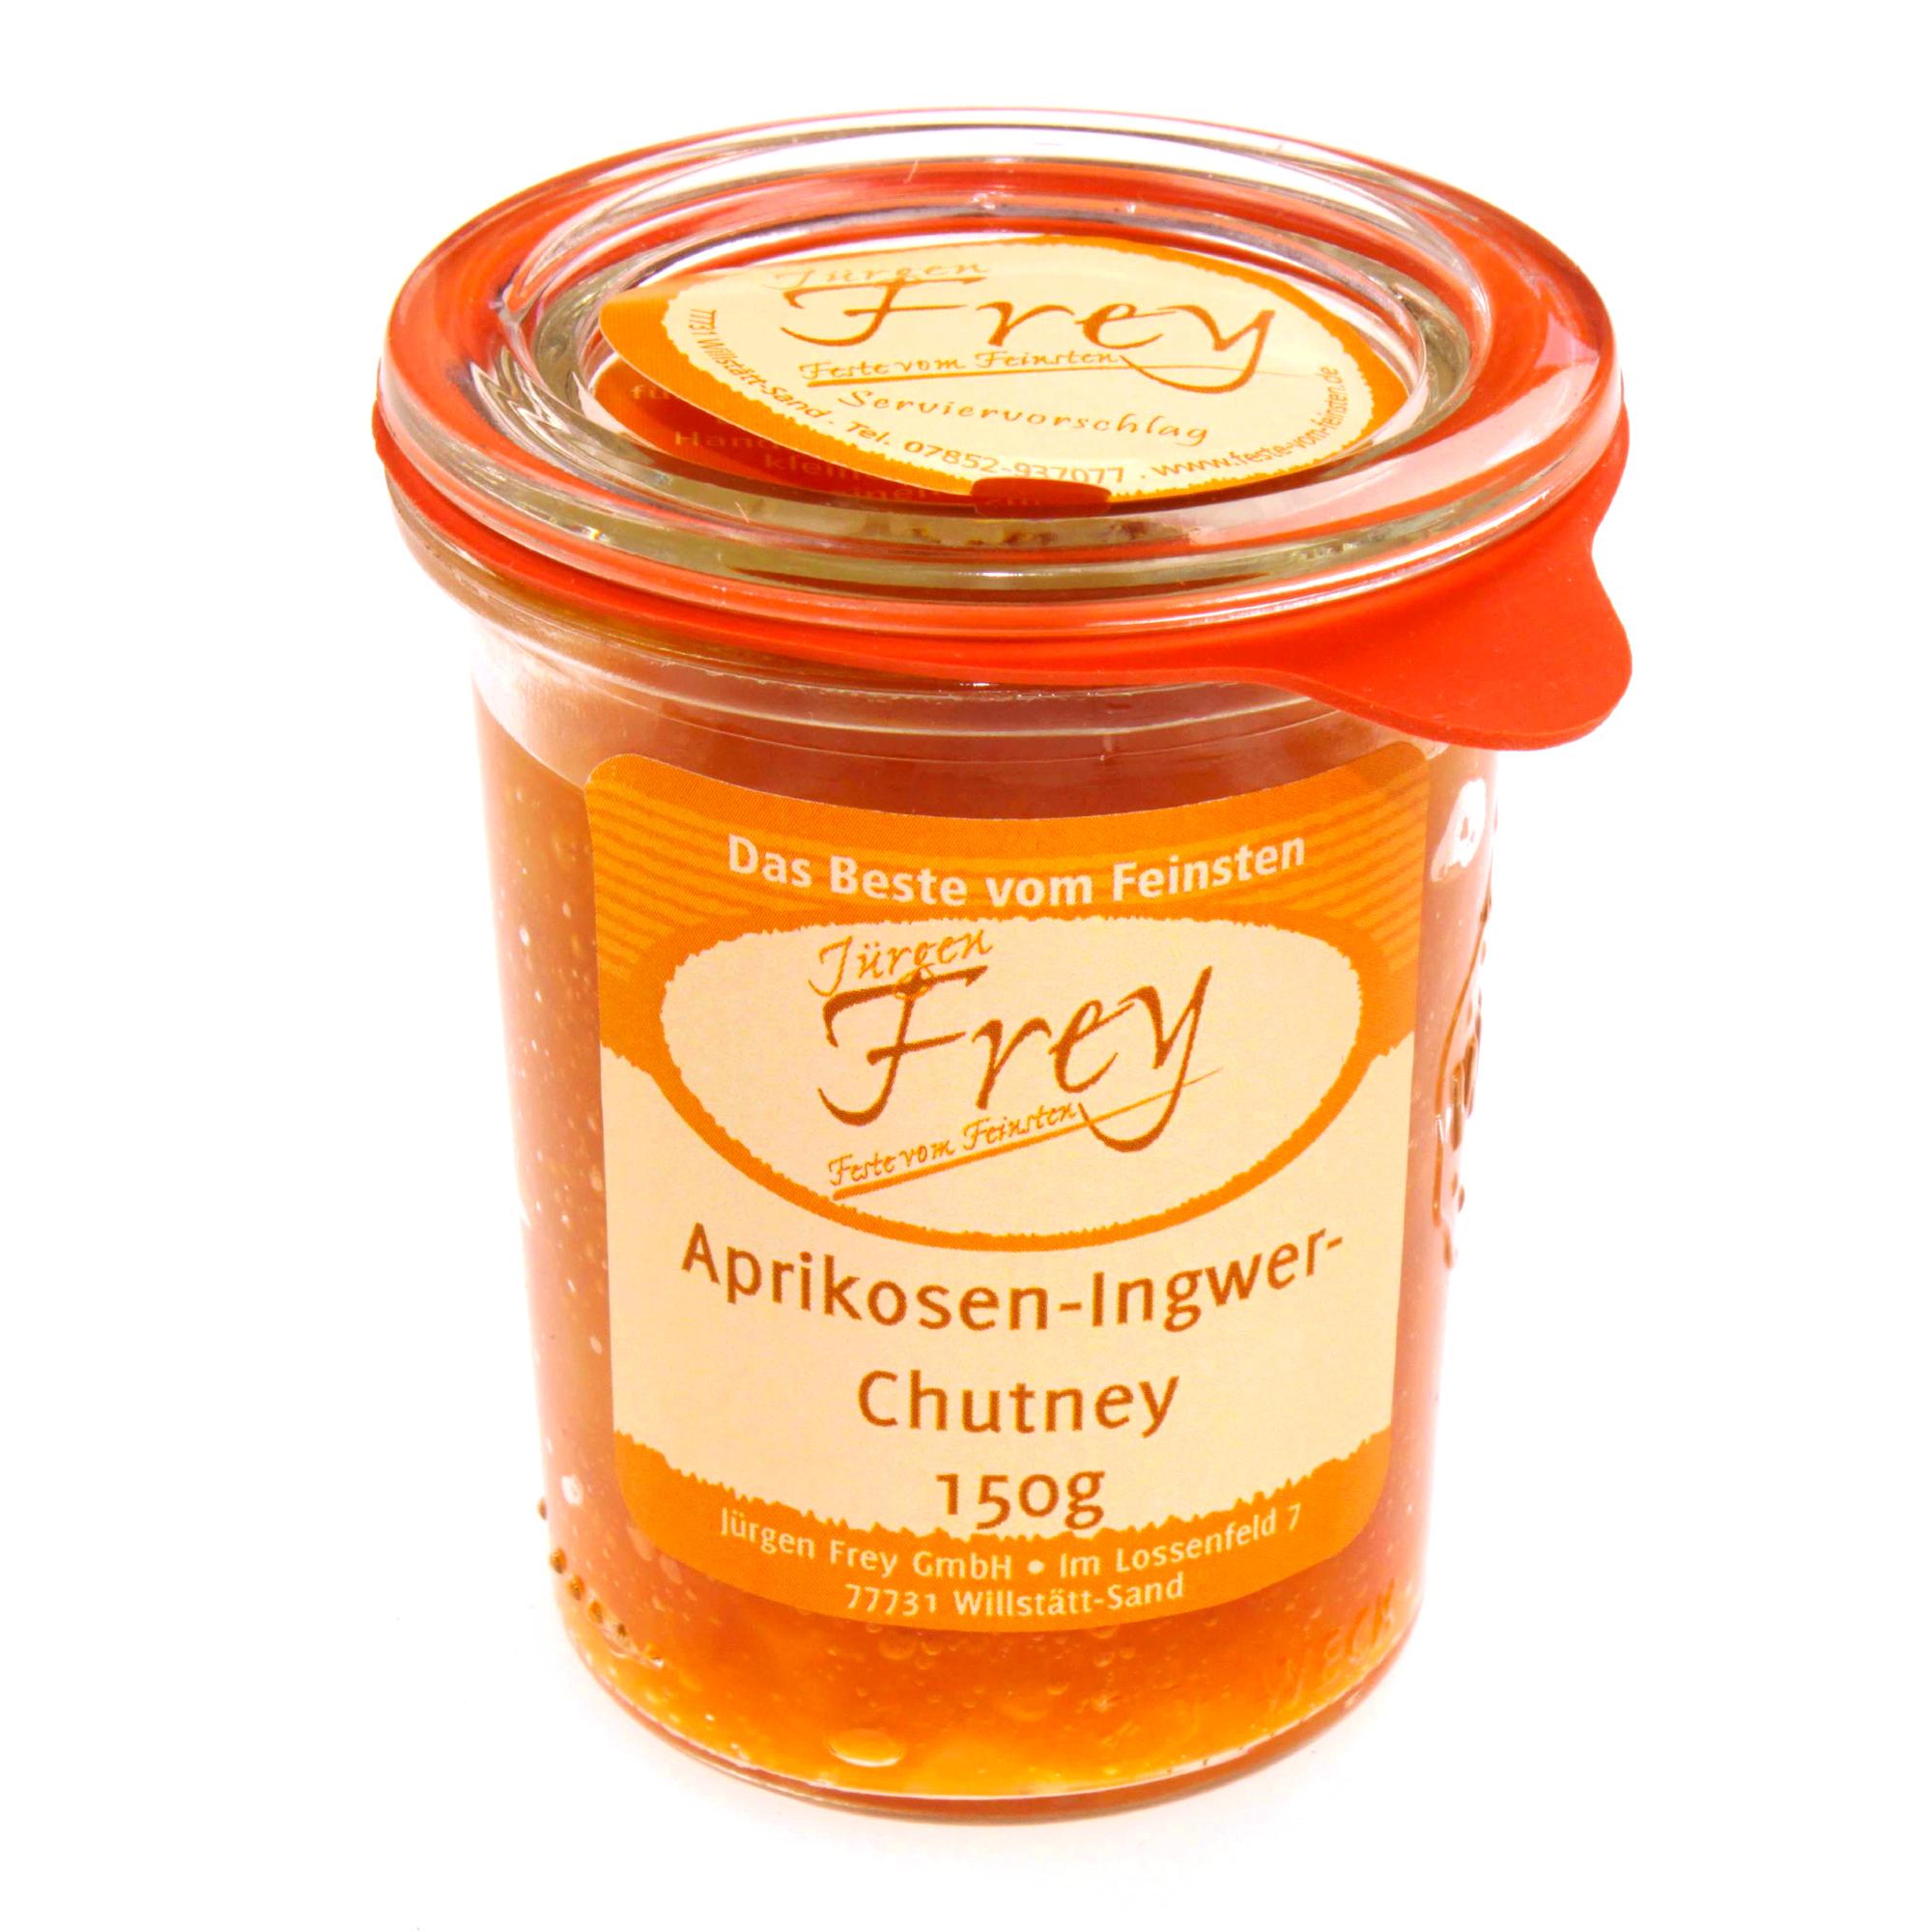 Aprikosen Ingwer-Chutney 150g